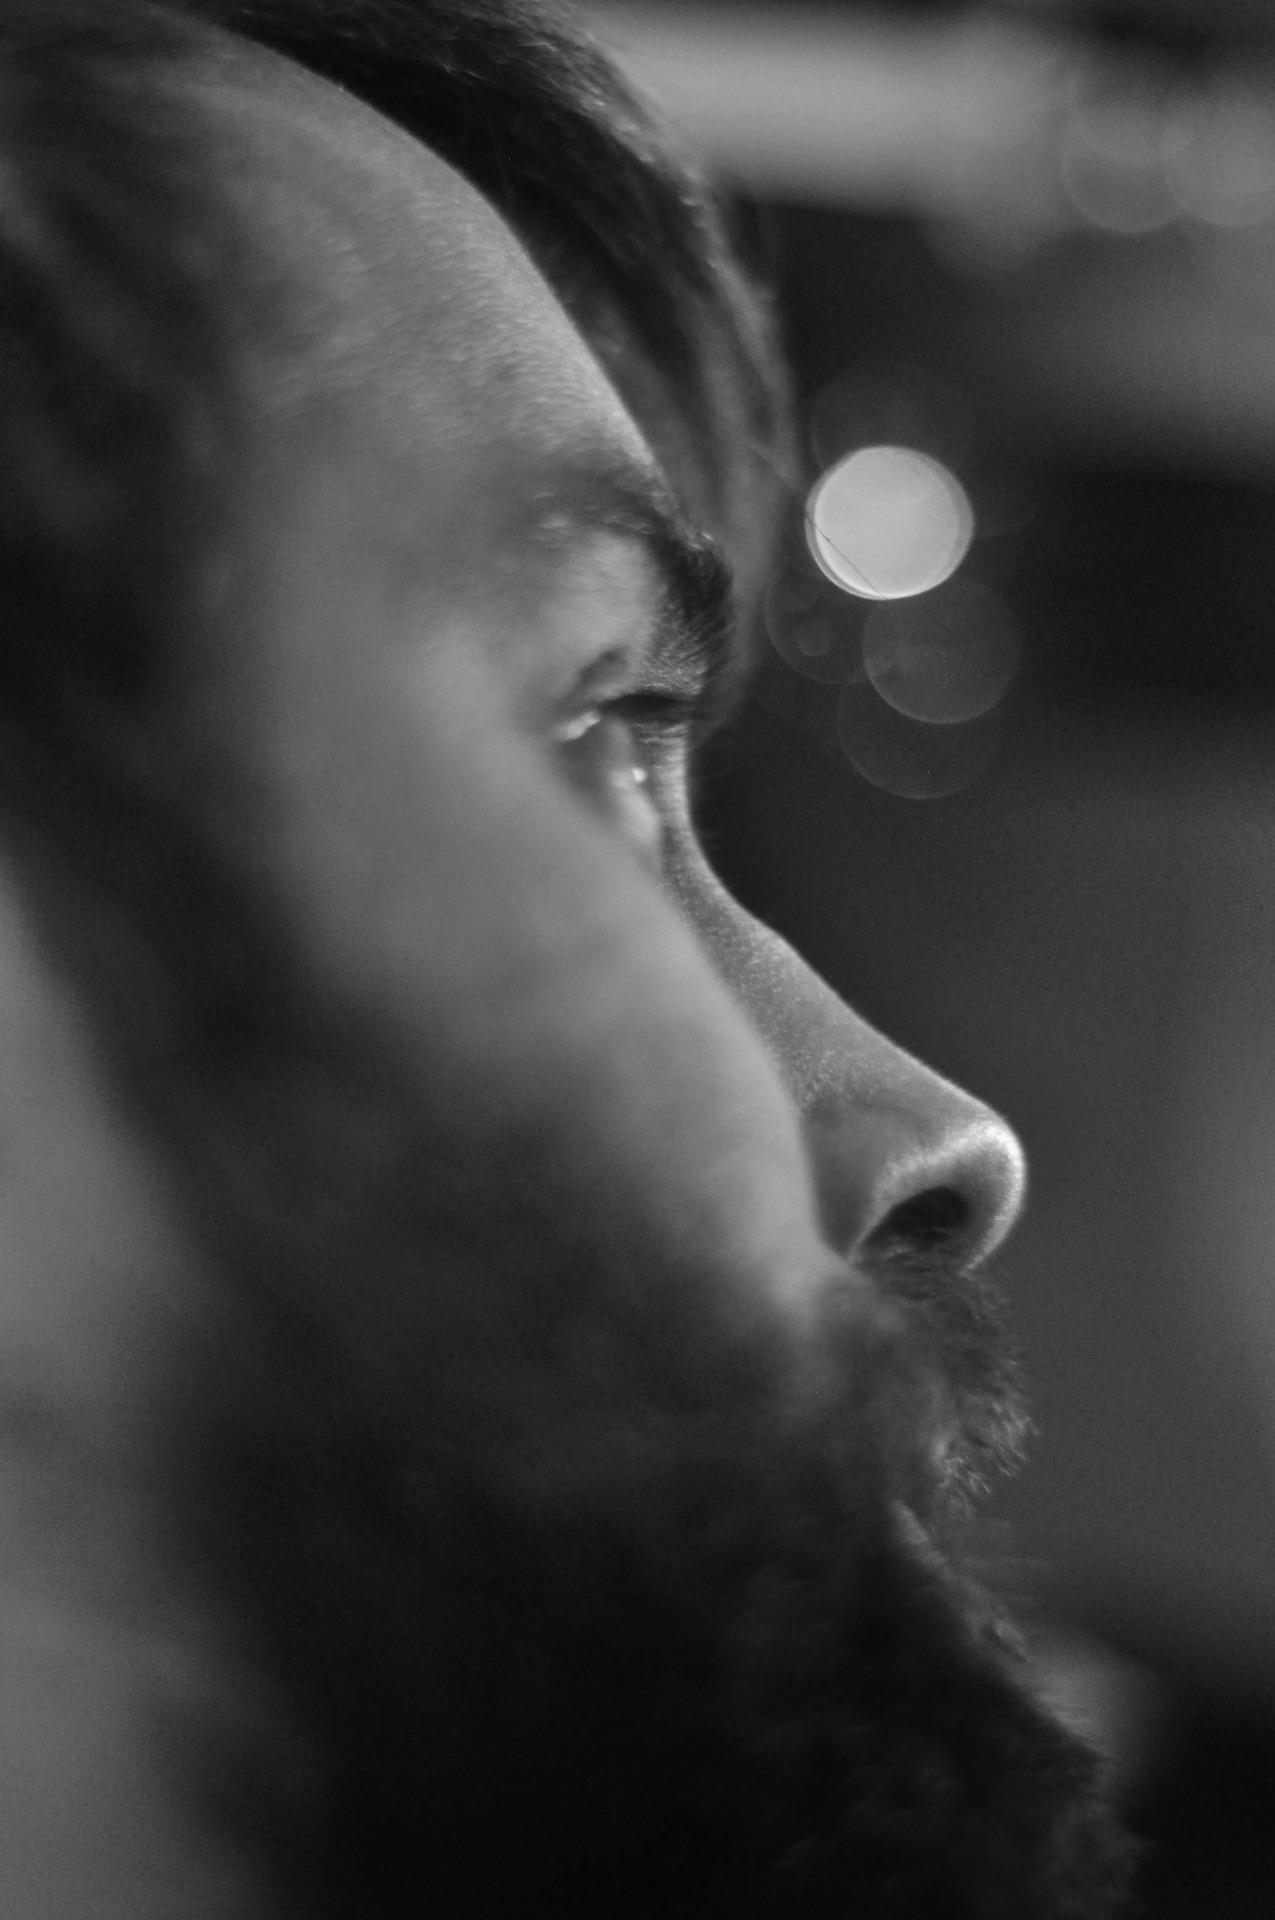 markdouglasscott boy in the bar beardburnme https://www.neofic.com